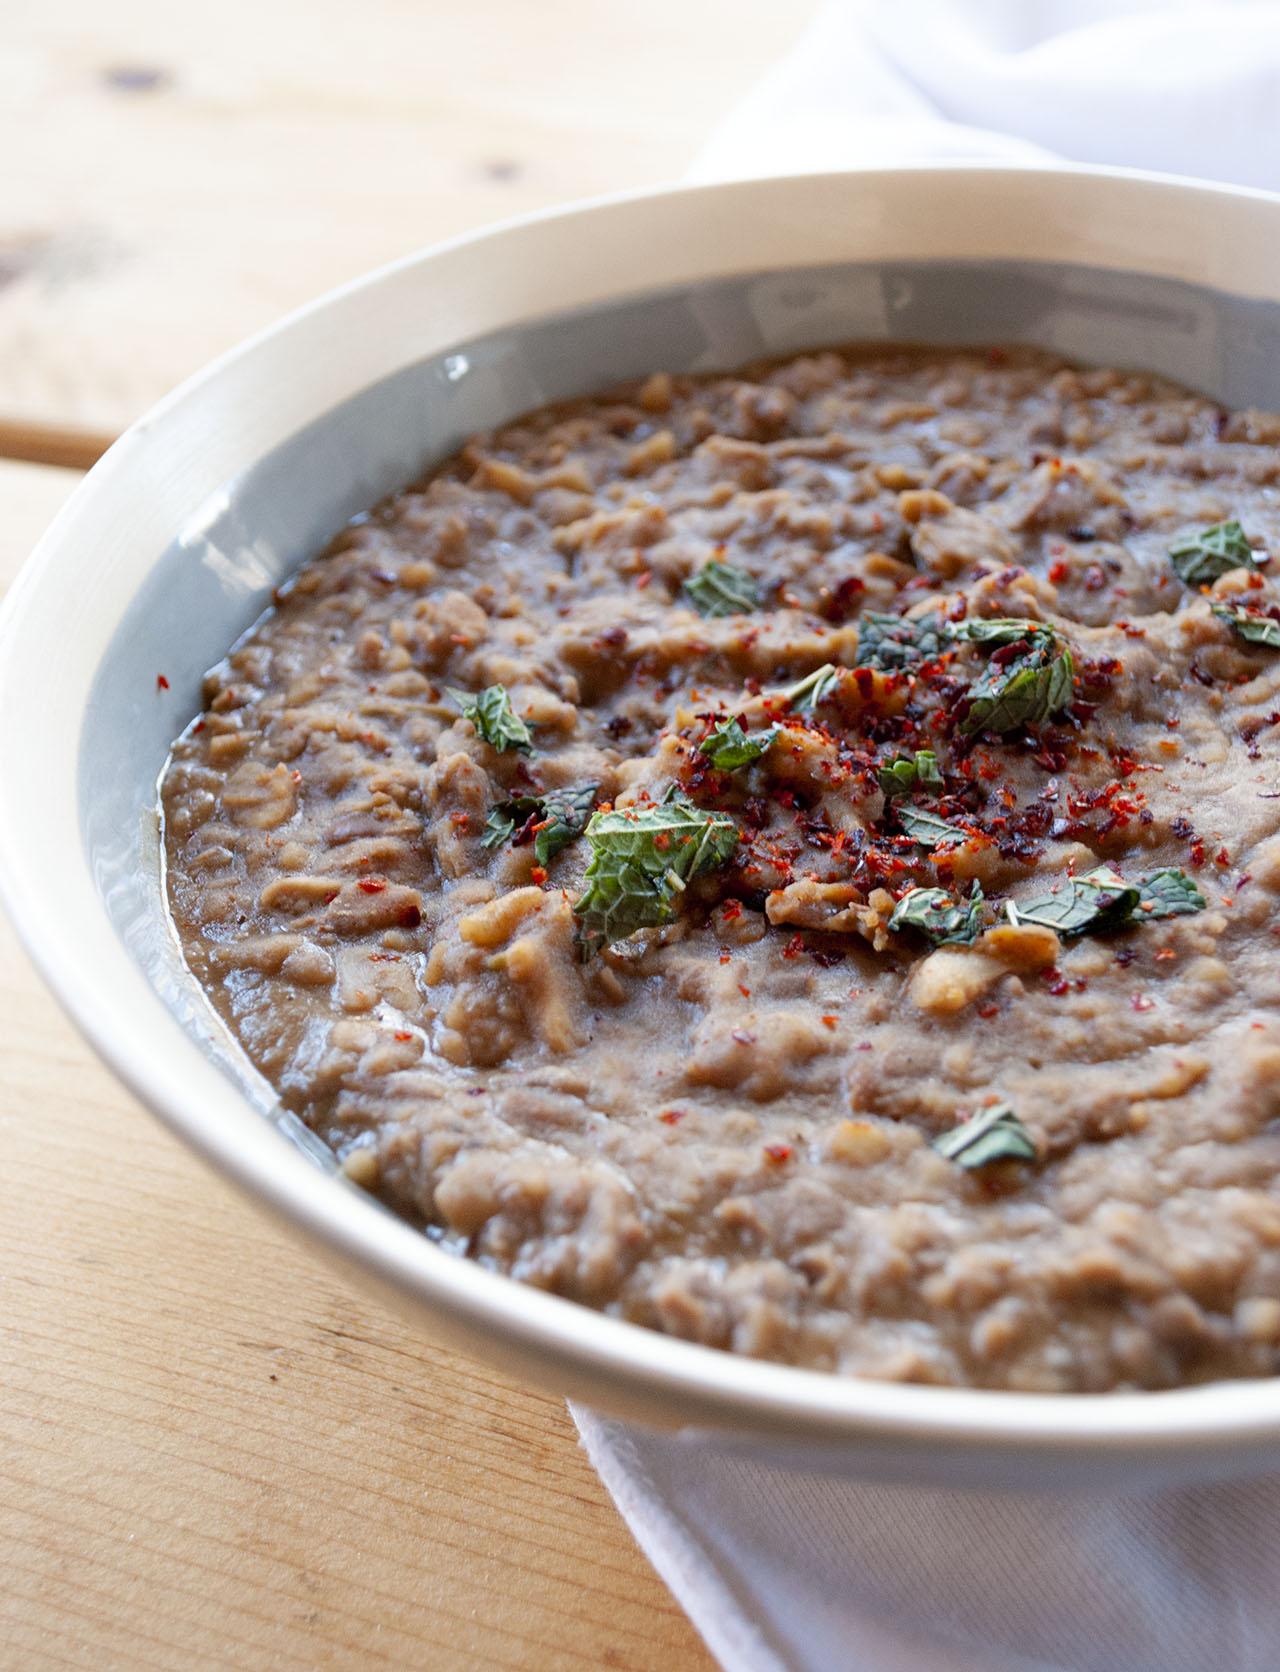 Mexicaanse bonenpuree (Refried beans)